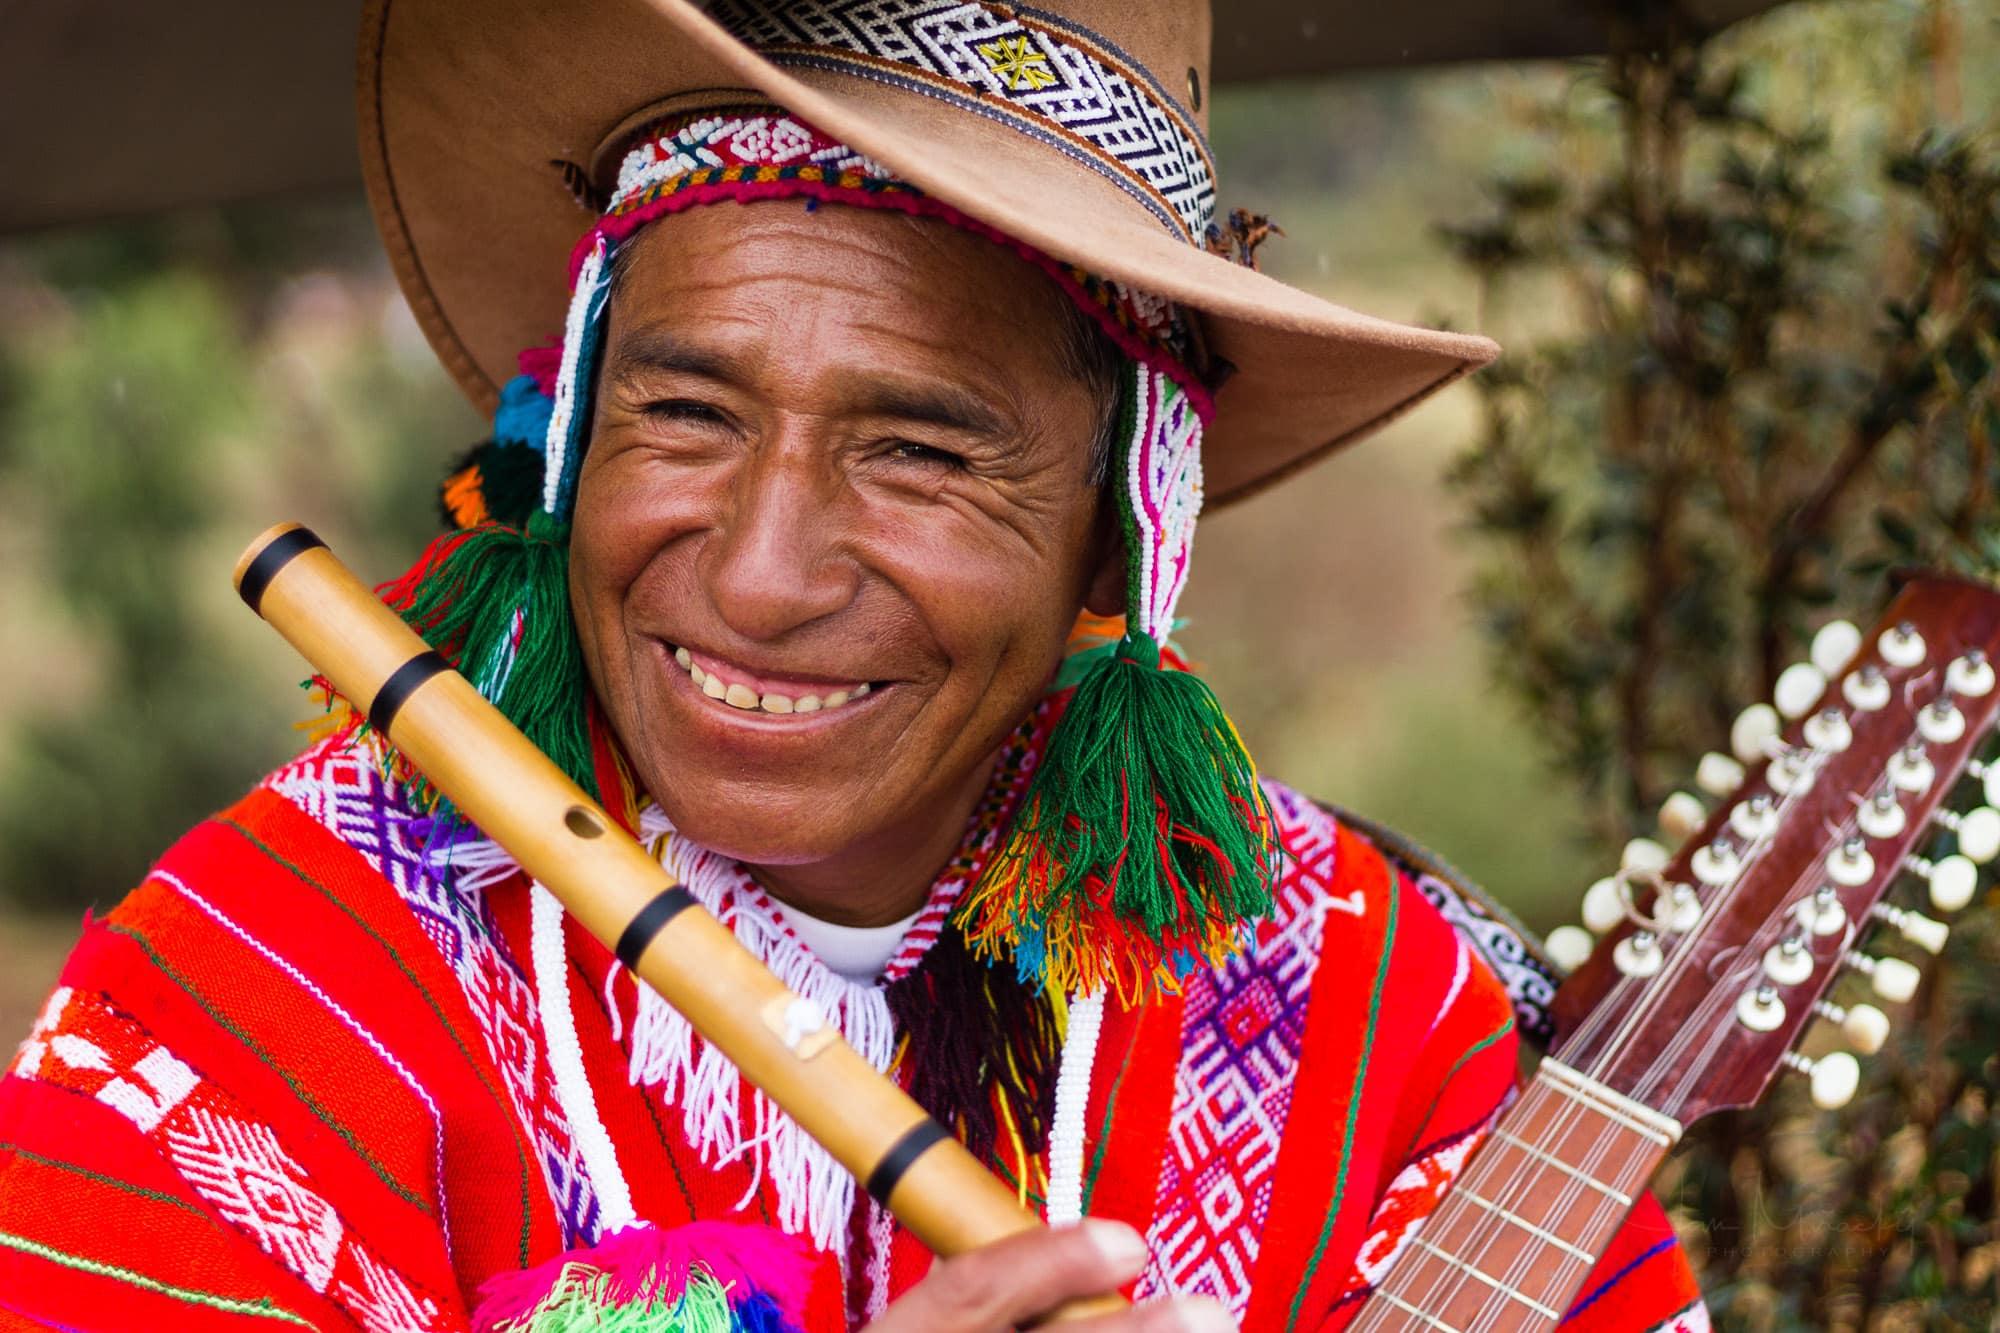 Peruvian musician plying flute and charangon